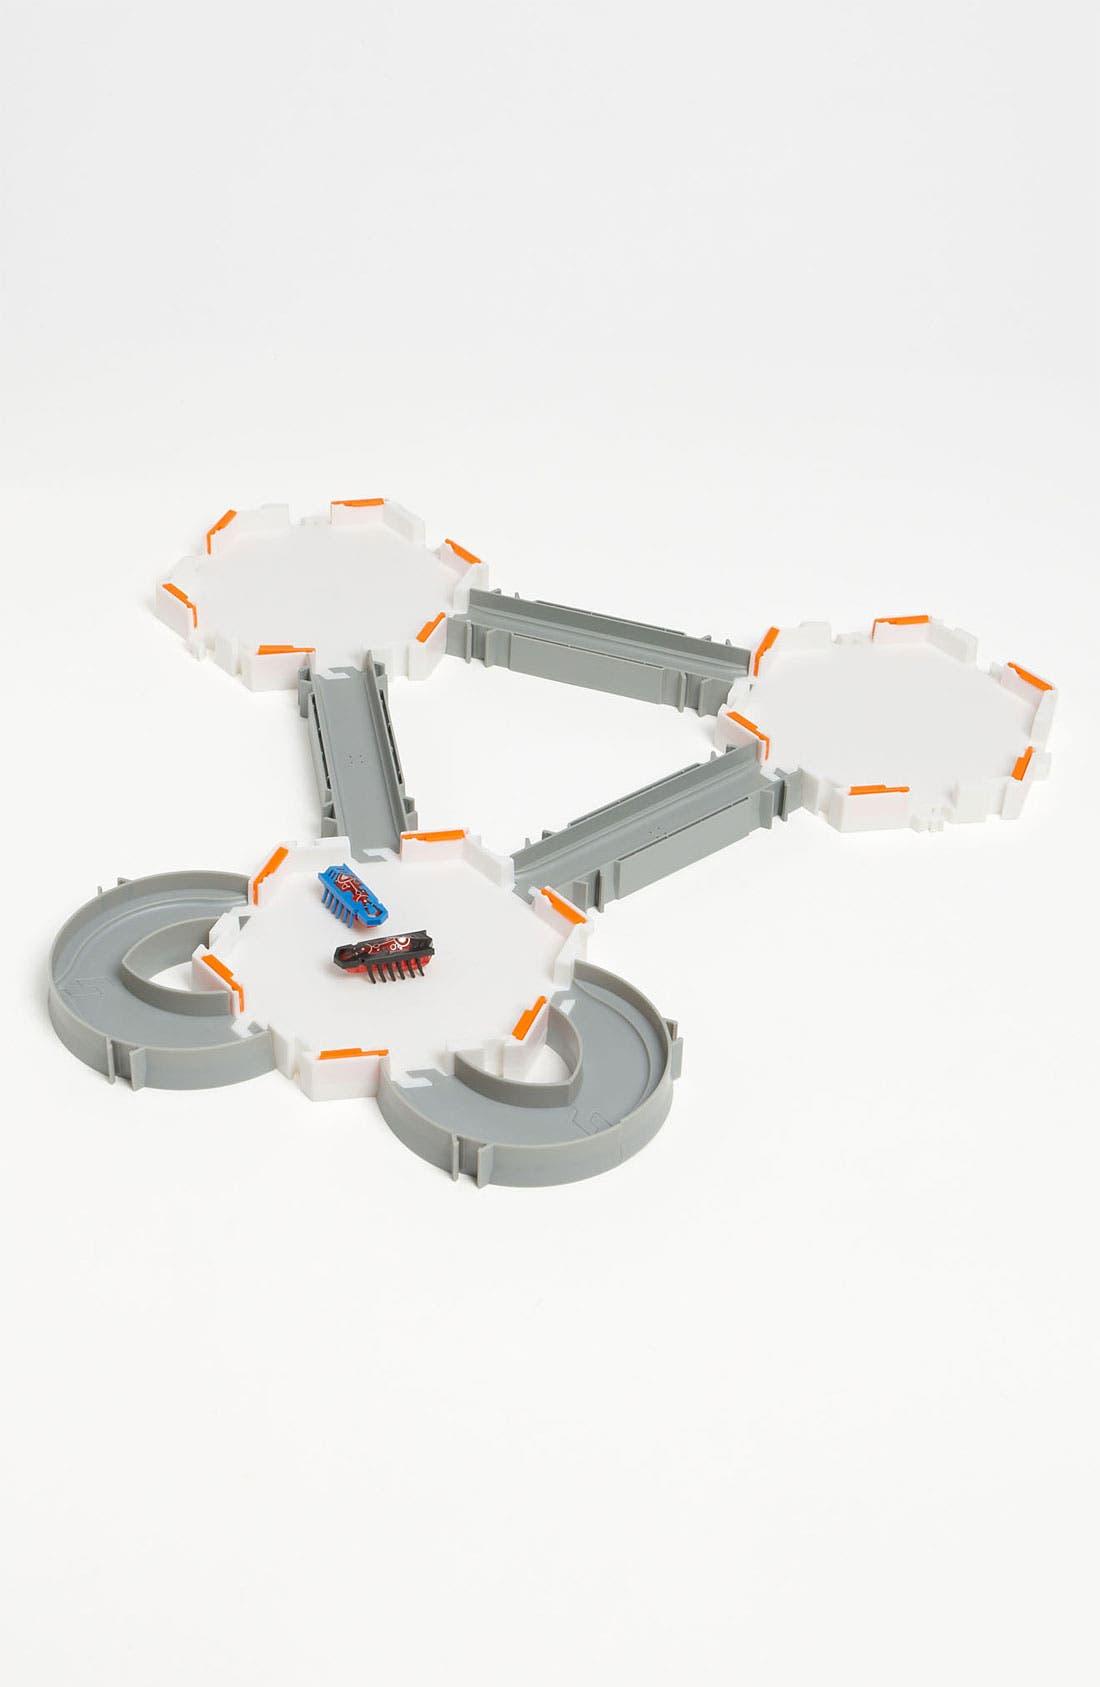 Alternate Image 1 Selected - Hexbug Toys Nano Habitat & Nano Bugs